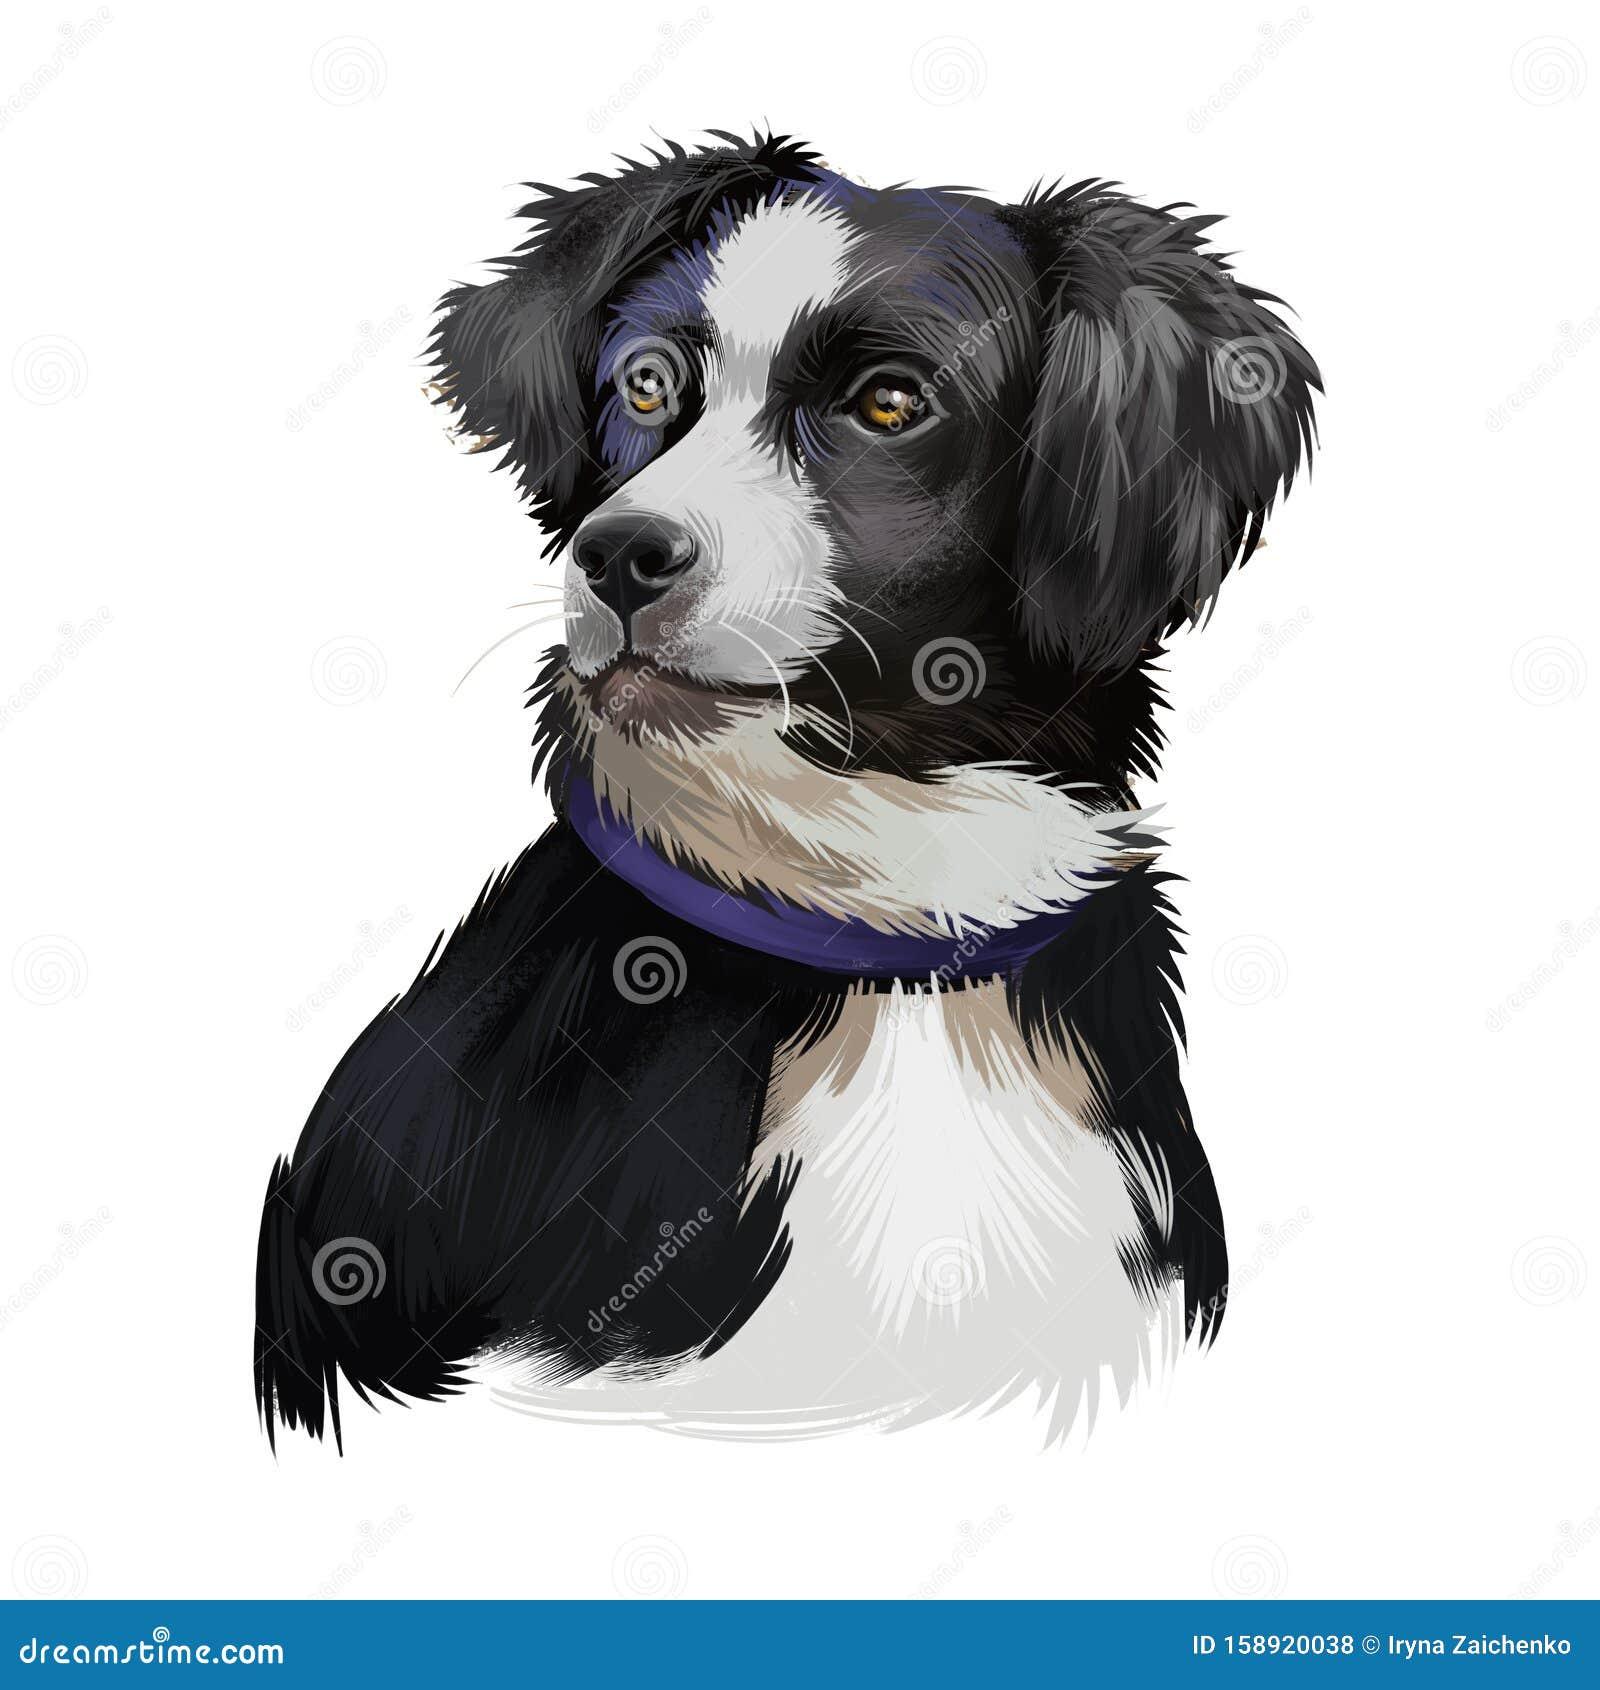 Australian Shepherd Dog Breed Digital Art Illustration Isolated On White Aussie Medium Sized Breed Of Dog Of Black And White Stock Illustration Illustration Of Digital Friend 158920038